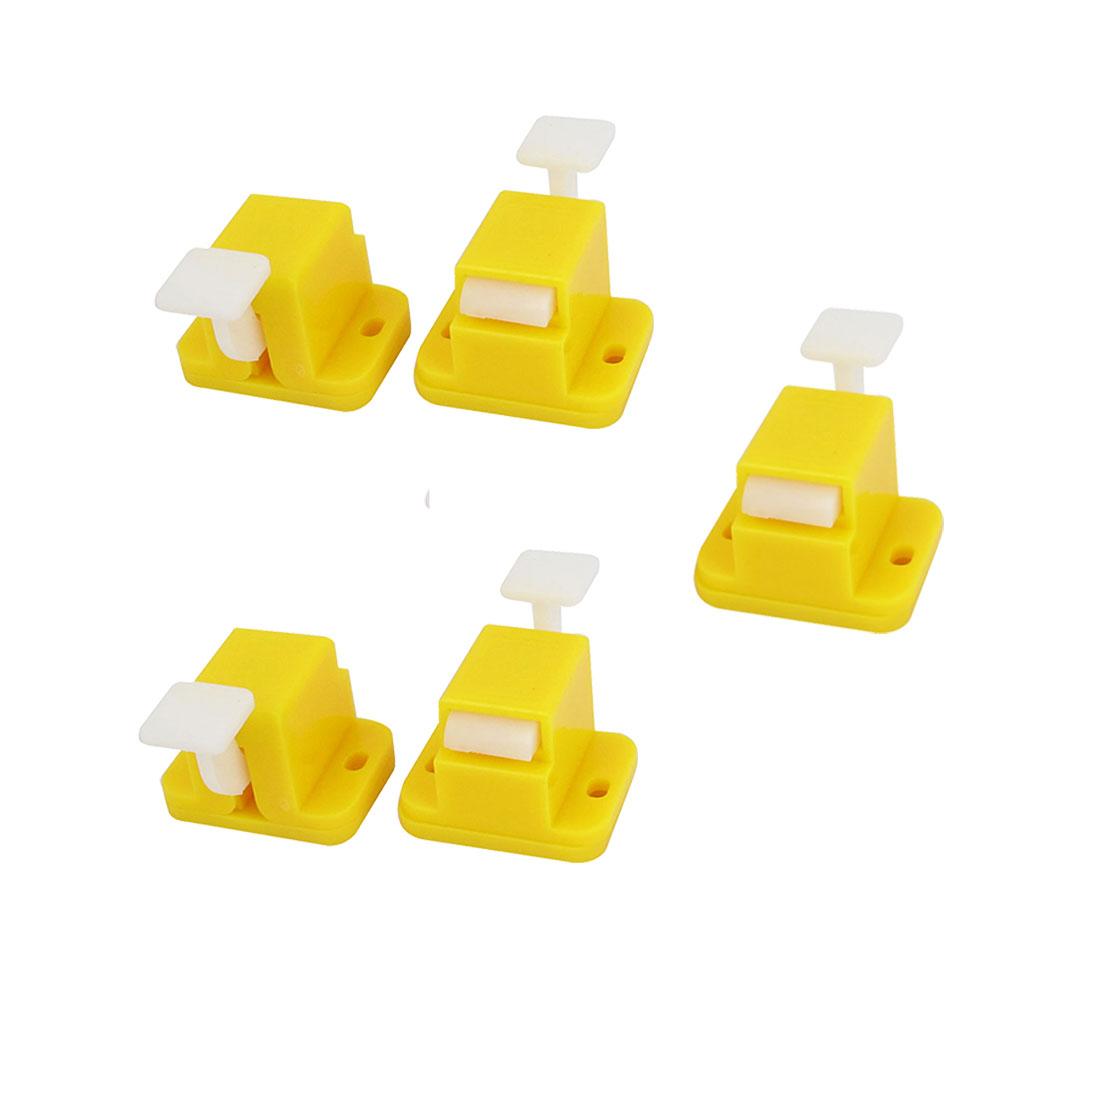 5 Pcs Plastic Prototype Test Fixture Jig Yellow for PCB Board DIY